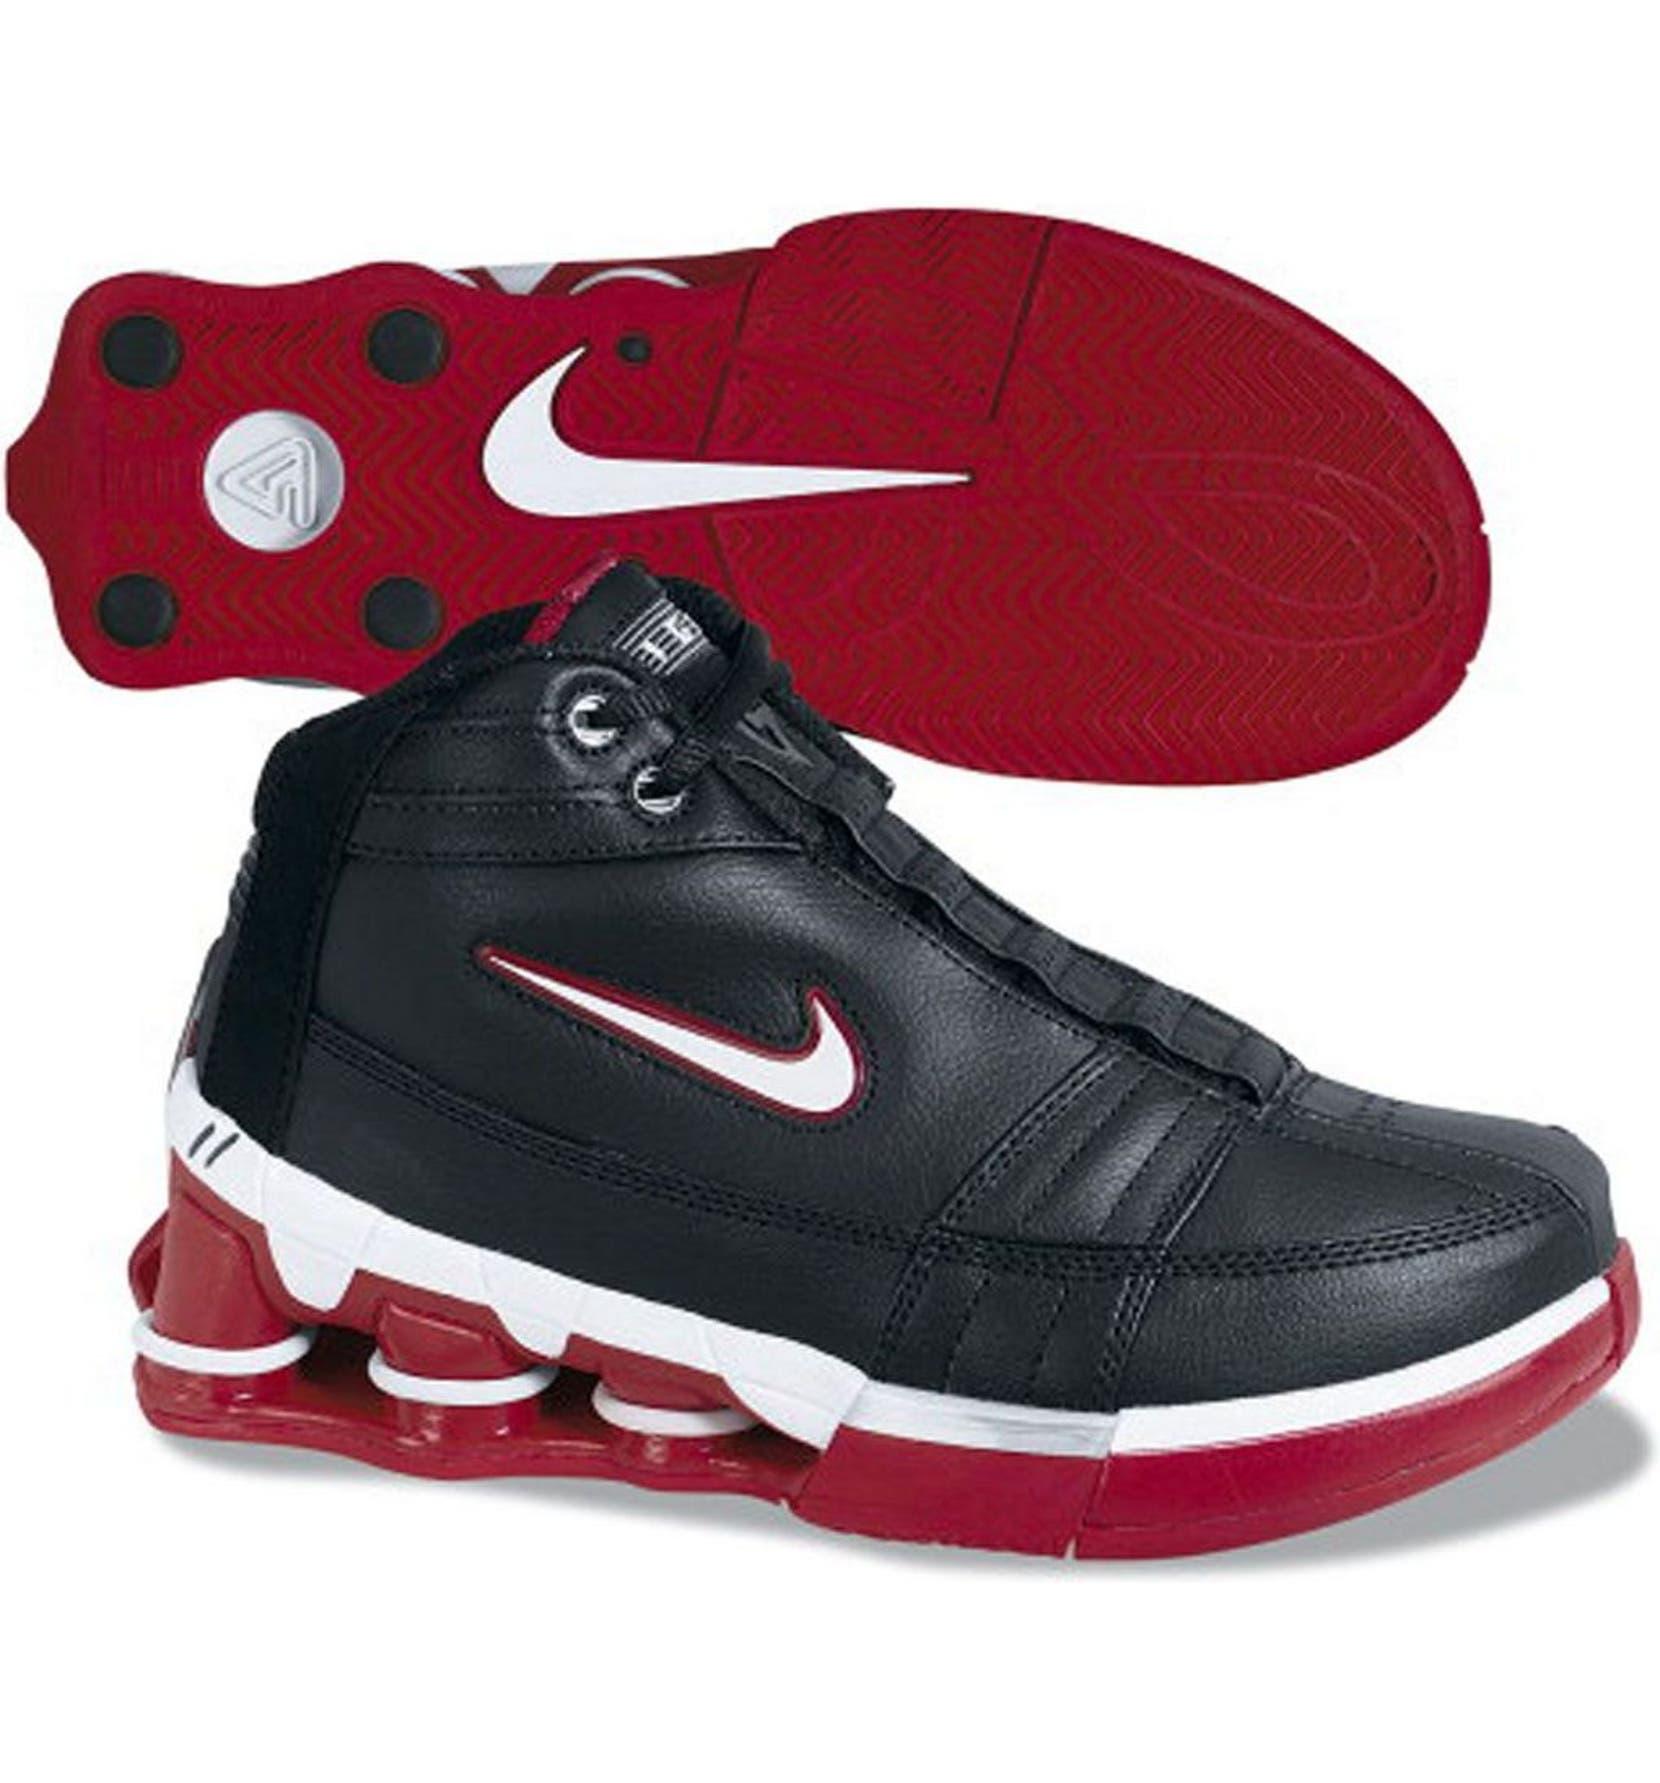 buy popular 29d76 2945e Nike  Shox VC IV  Basketball Shoe (Big Kids)   Nordstrom